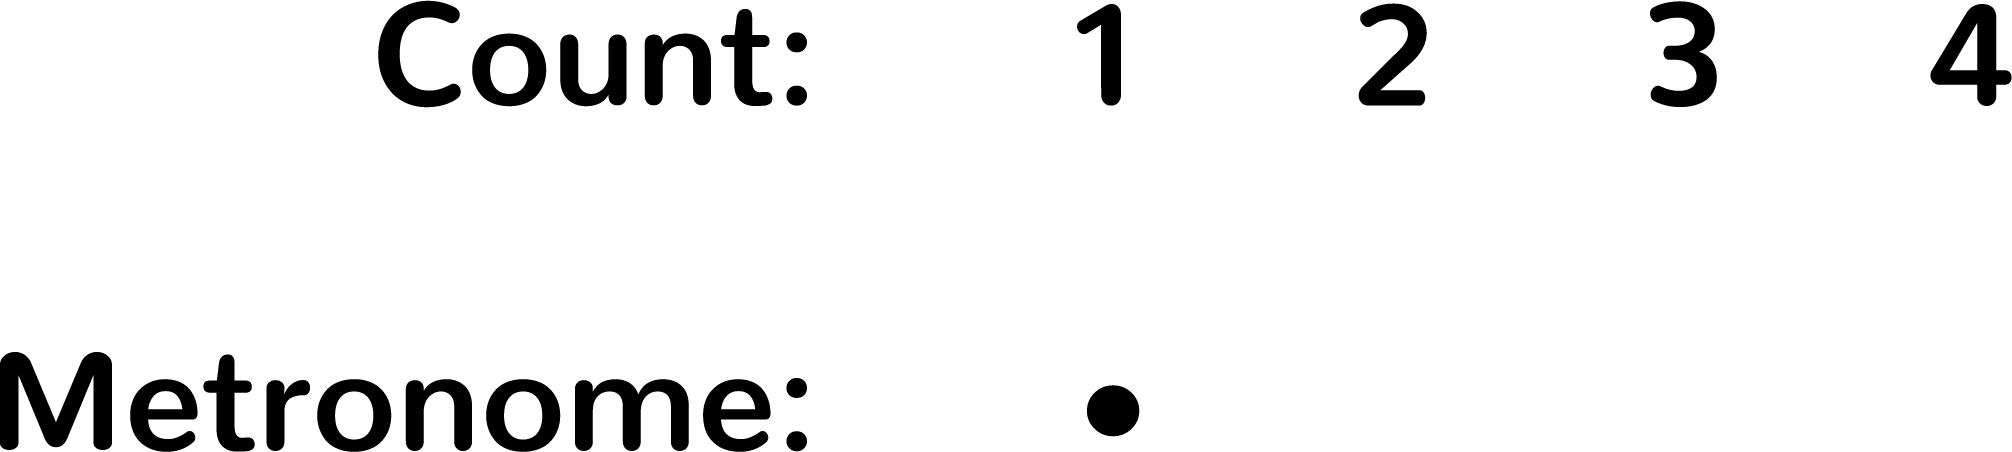 Level 3 Metronome Exercise